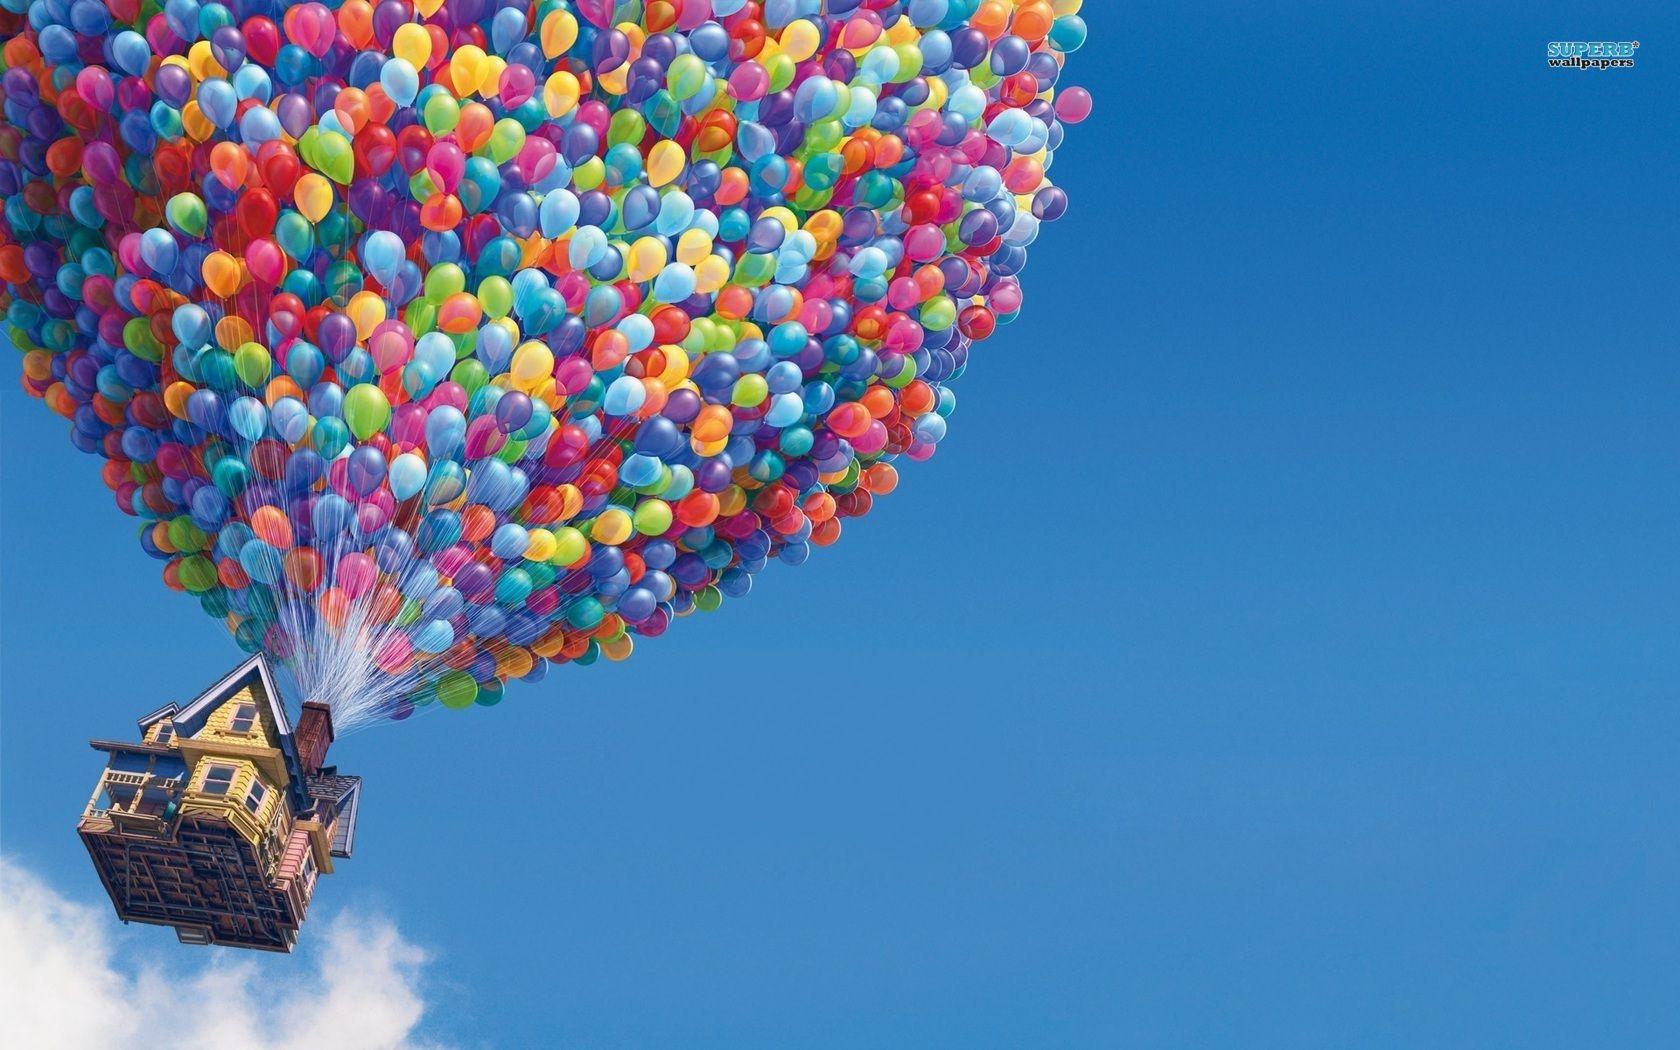 Disney Pixar S Up High Definition Wallpapers Up Pixar Cartoon Wallpaper Disney Wallpaper